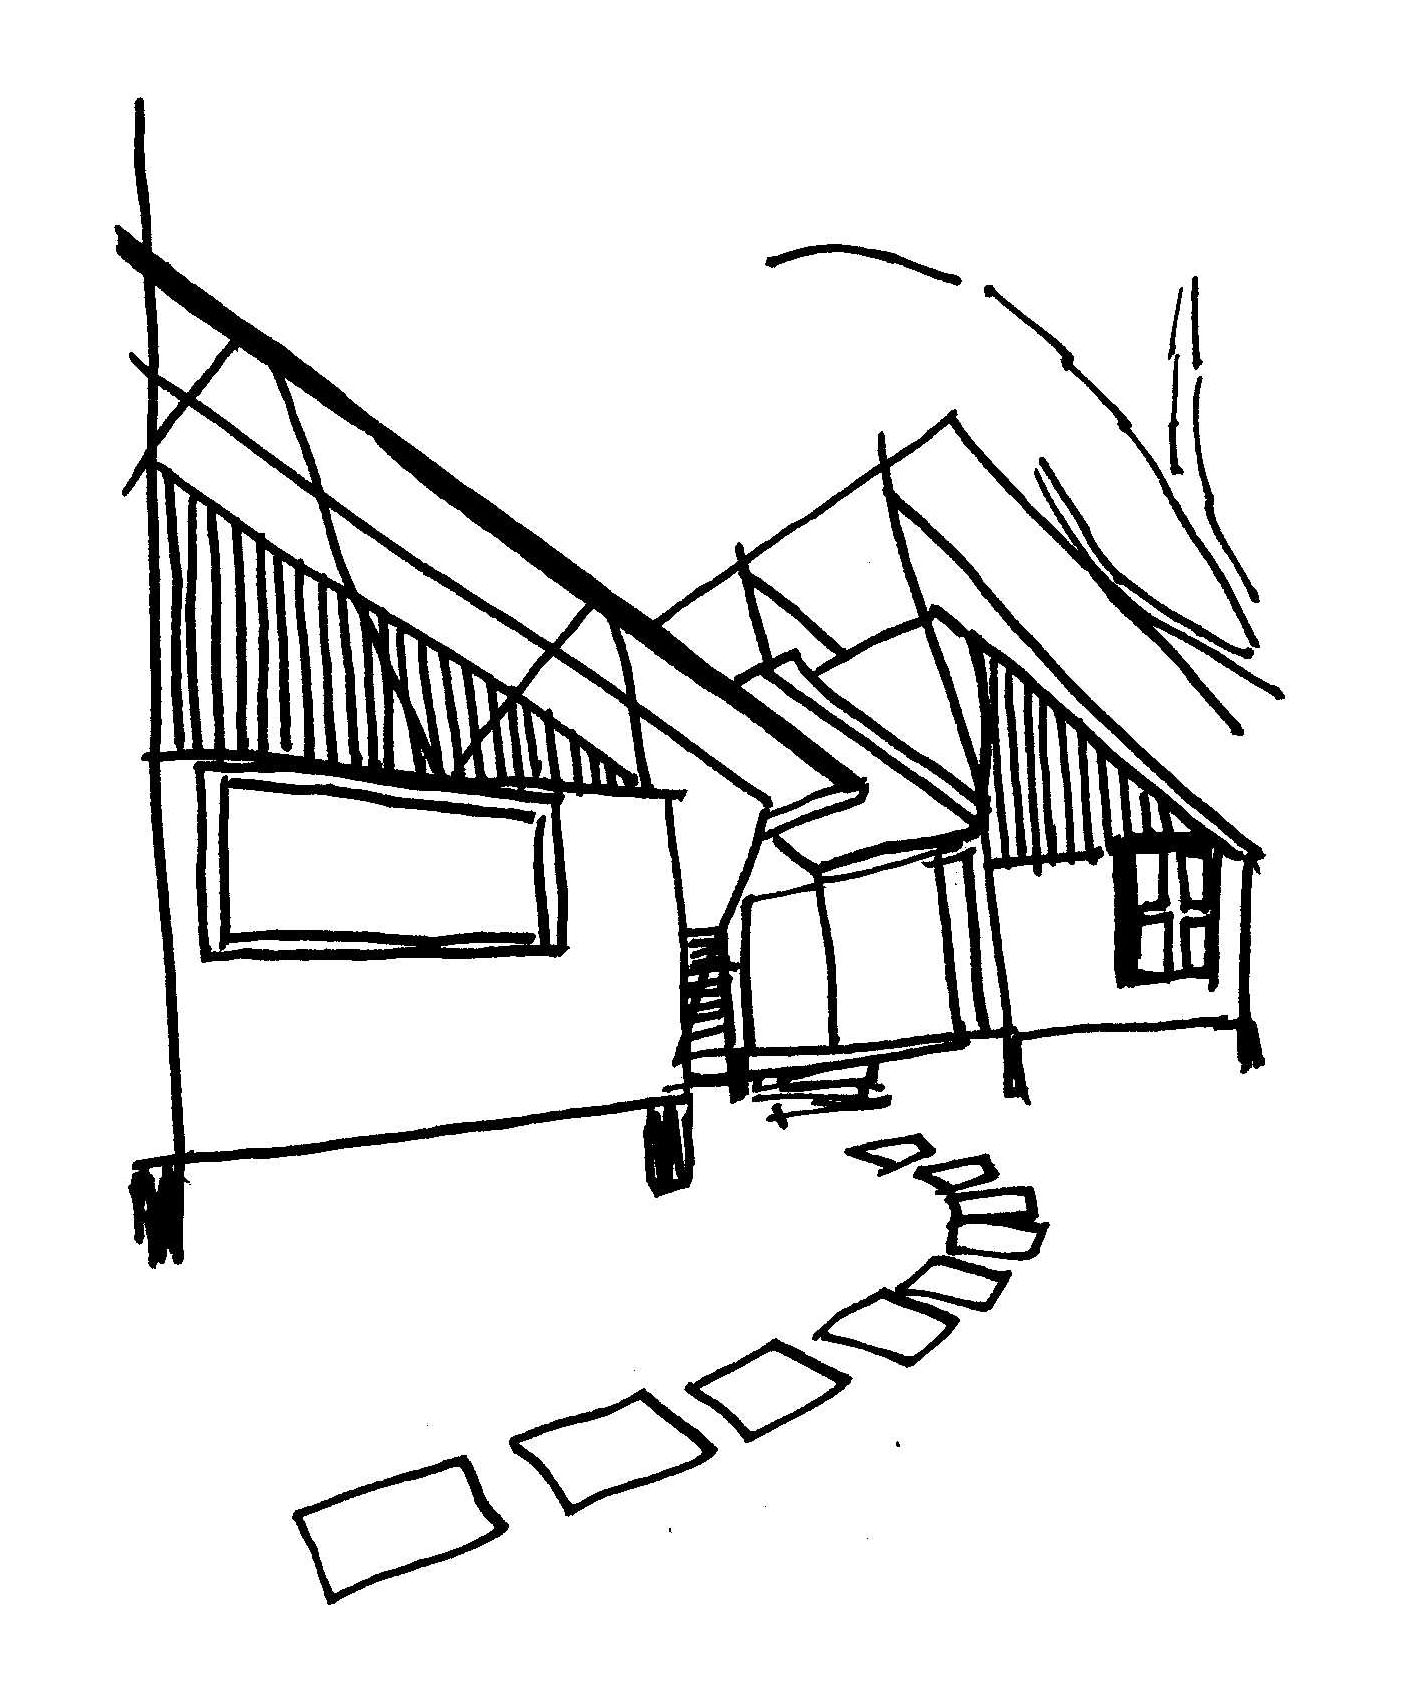 Dab310 Architectural Apprenticeship